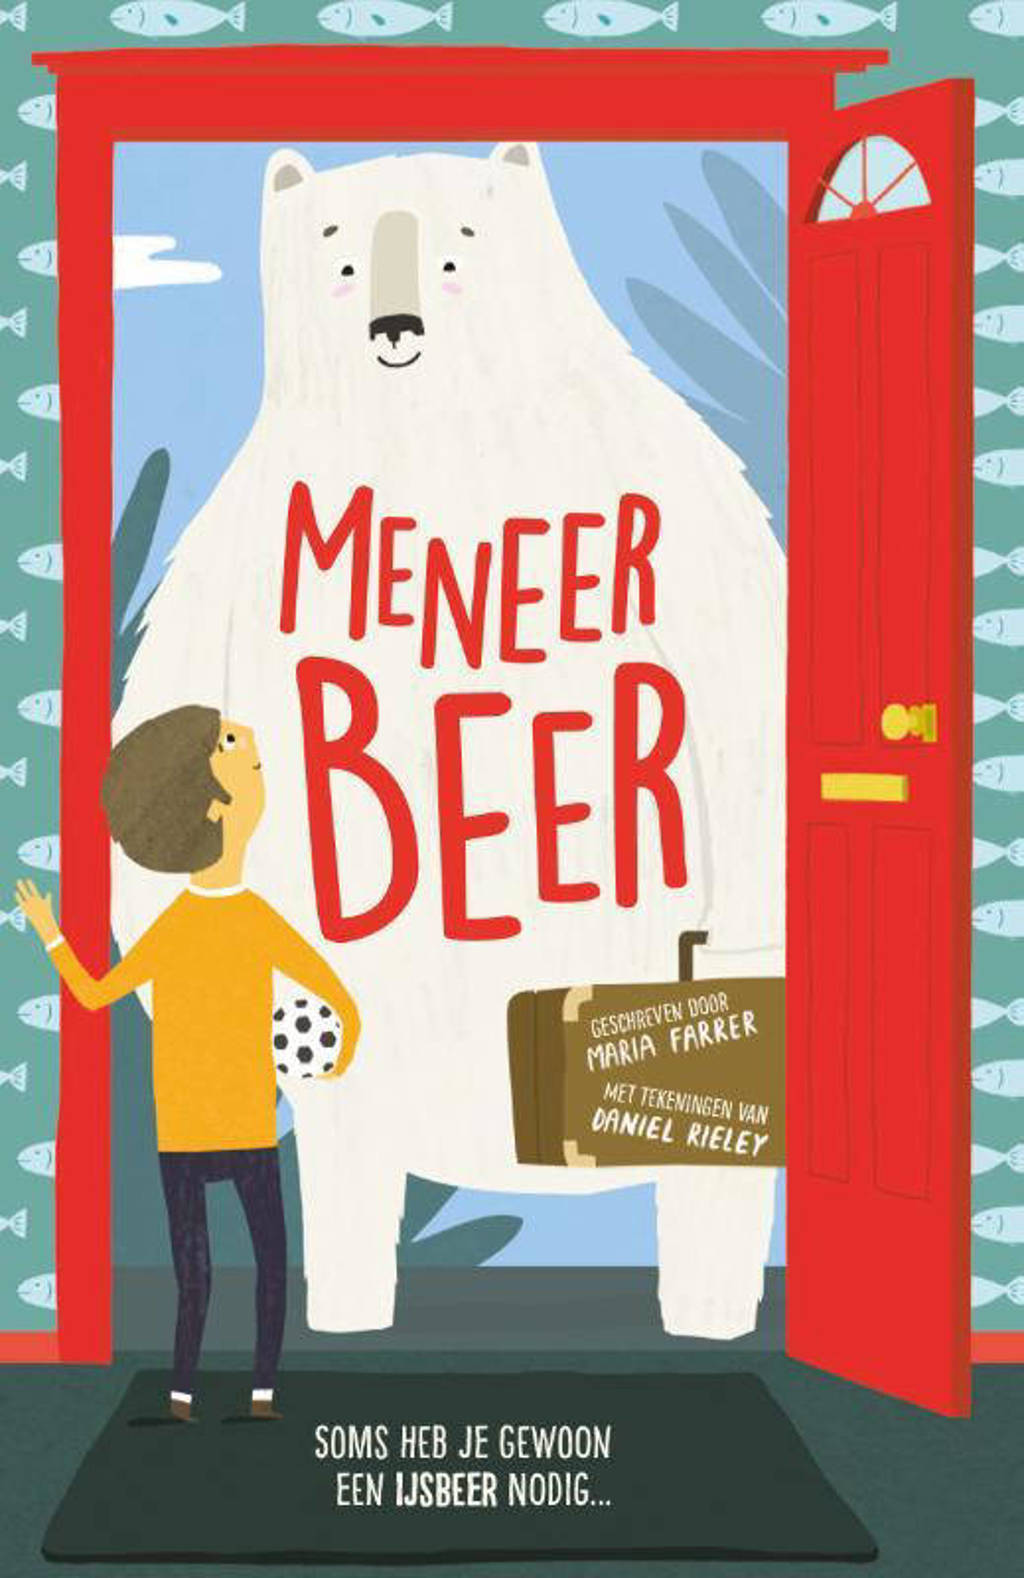 Meneer Beer - Maria Farrer